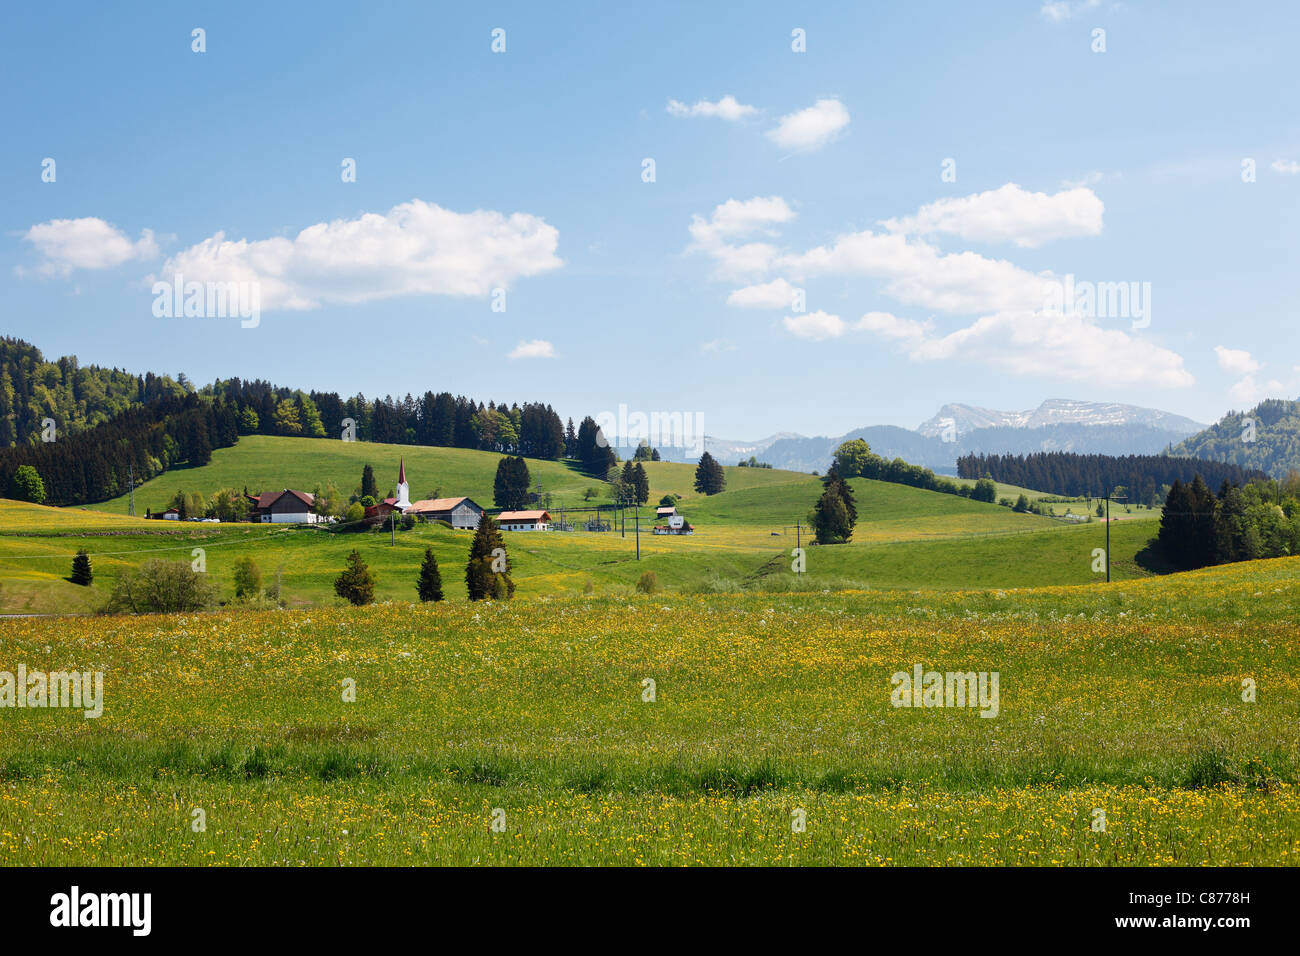 Germany, Bavaria, Swabia, Allgaeu, Oberallgaeu, Oberstaufen, Zell, View of village with meadow - Stock Image